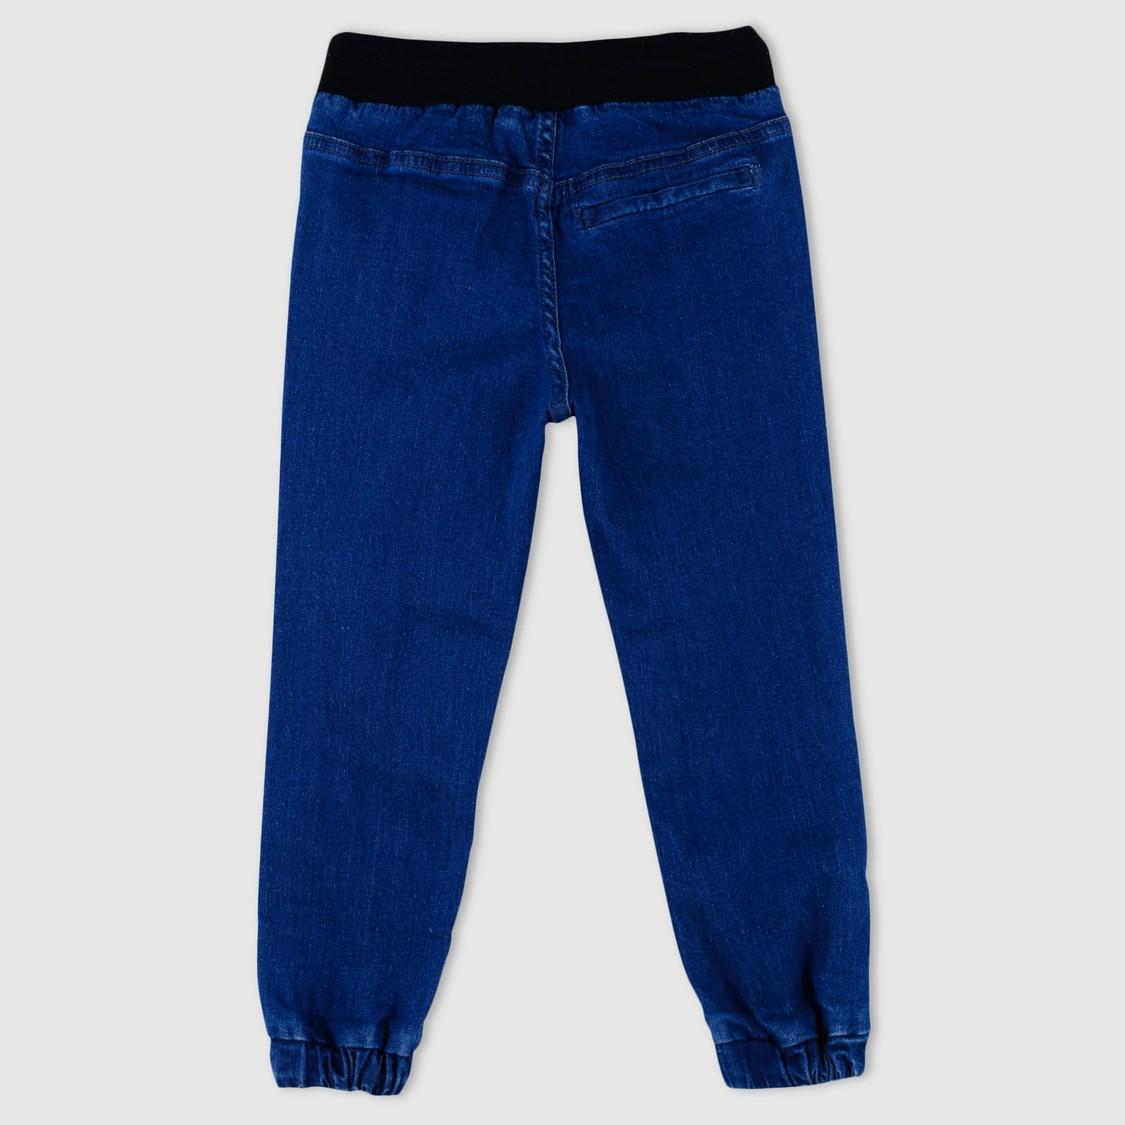 Minion Printed Full Length Jog Pants with Elasticised Waistband